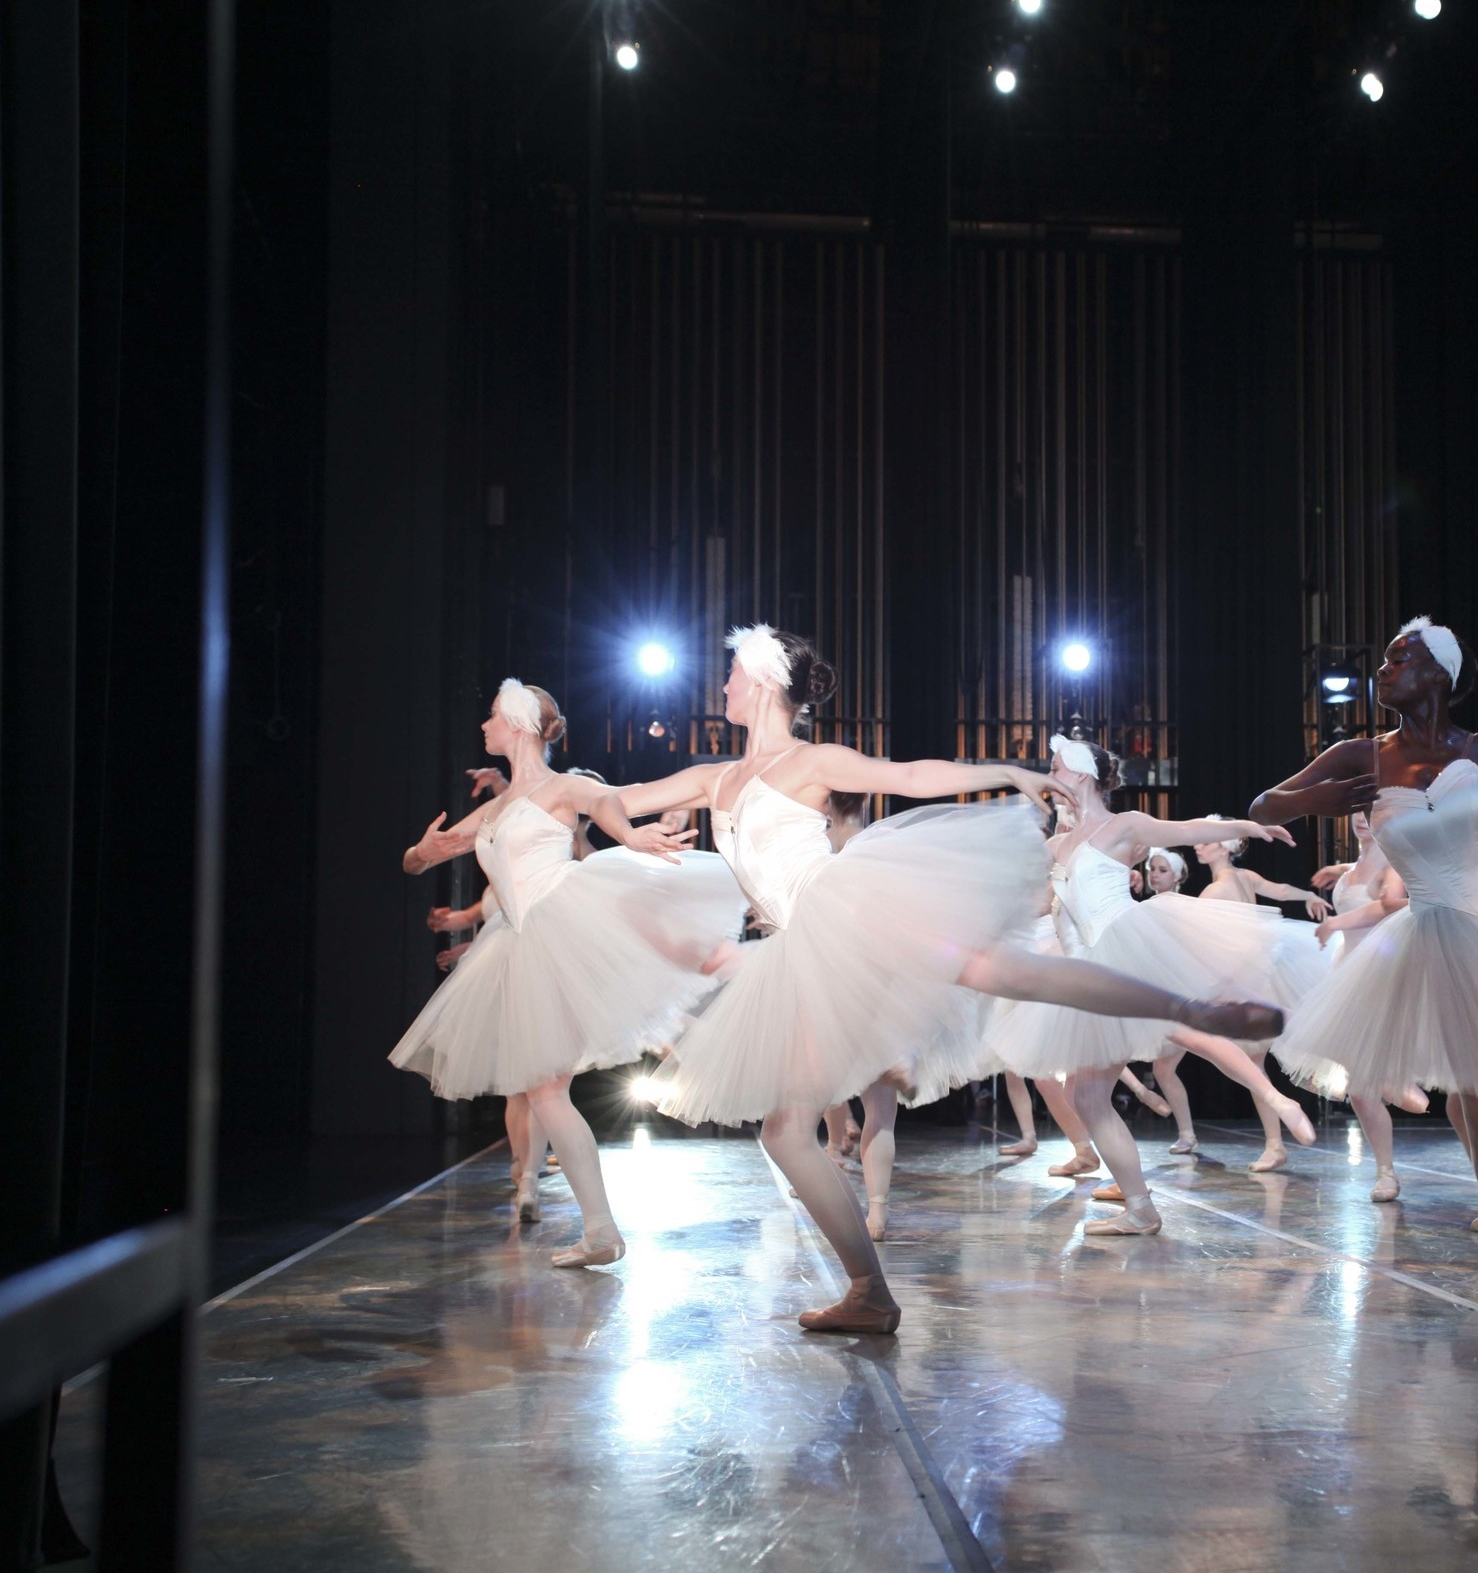 emma burton - Swanlake © The George Balanchine Trust